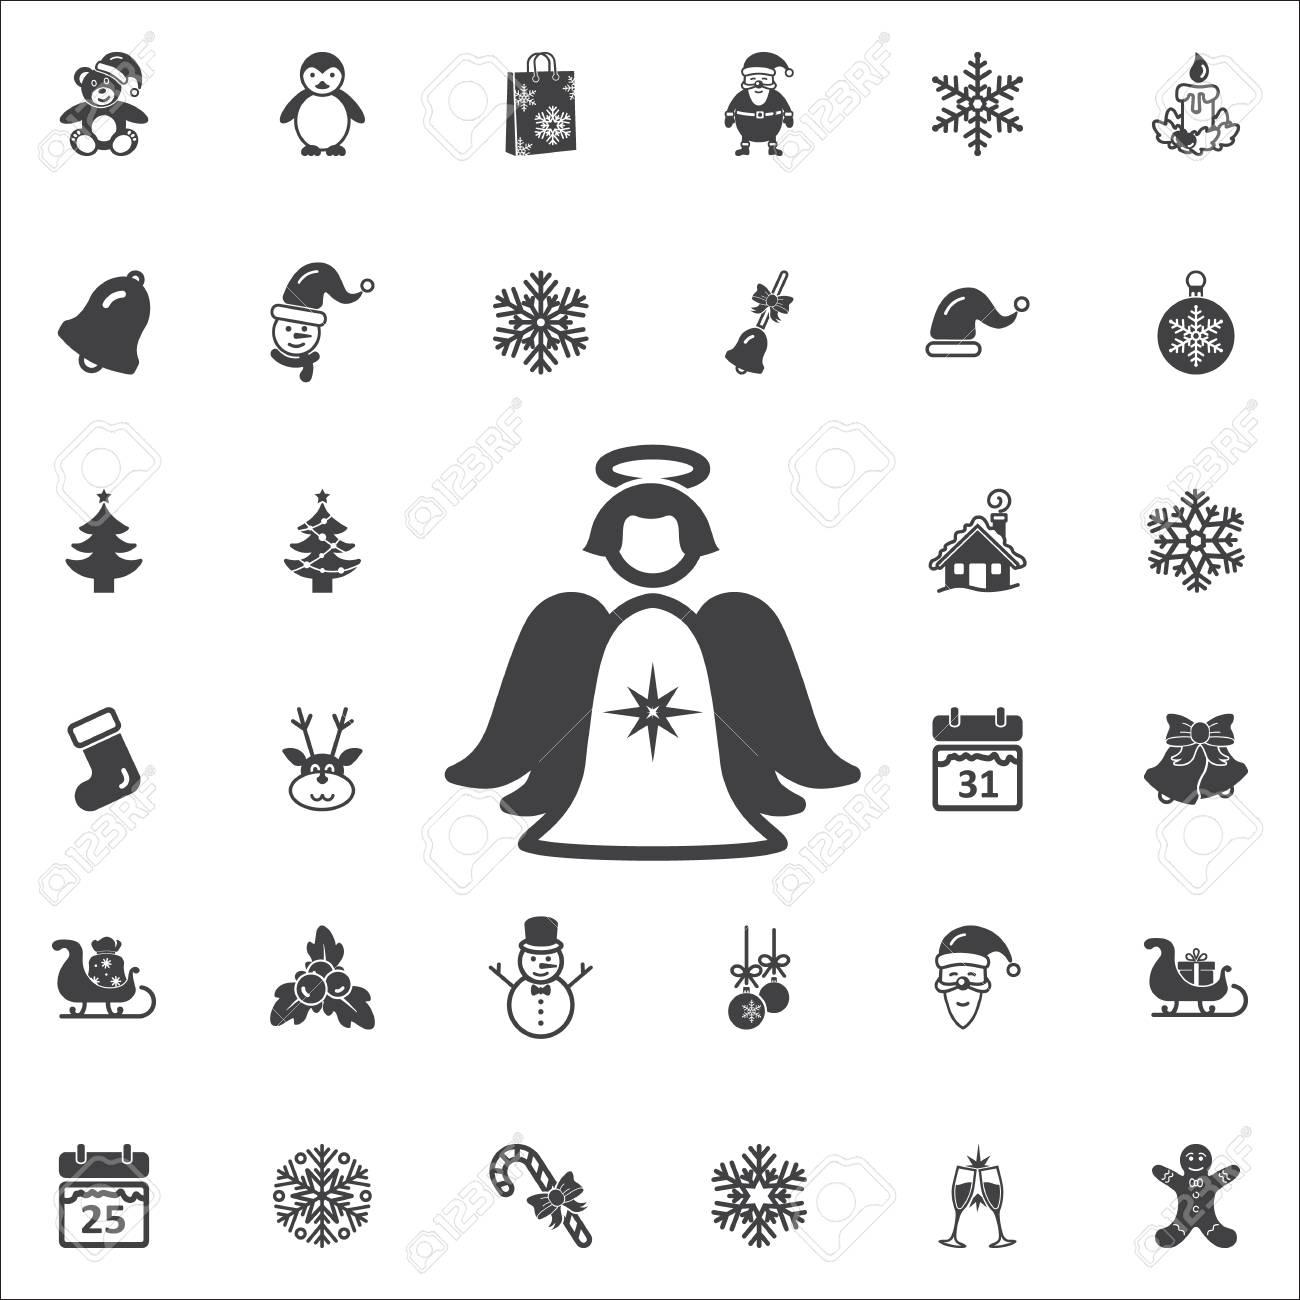 Christmas Holidays Icon.Christmas Angel Icon New Year Set Of Icons Christmas Holidays